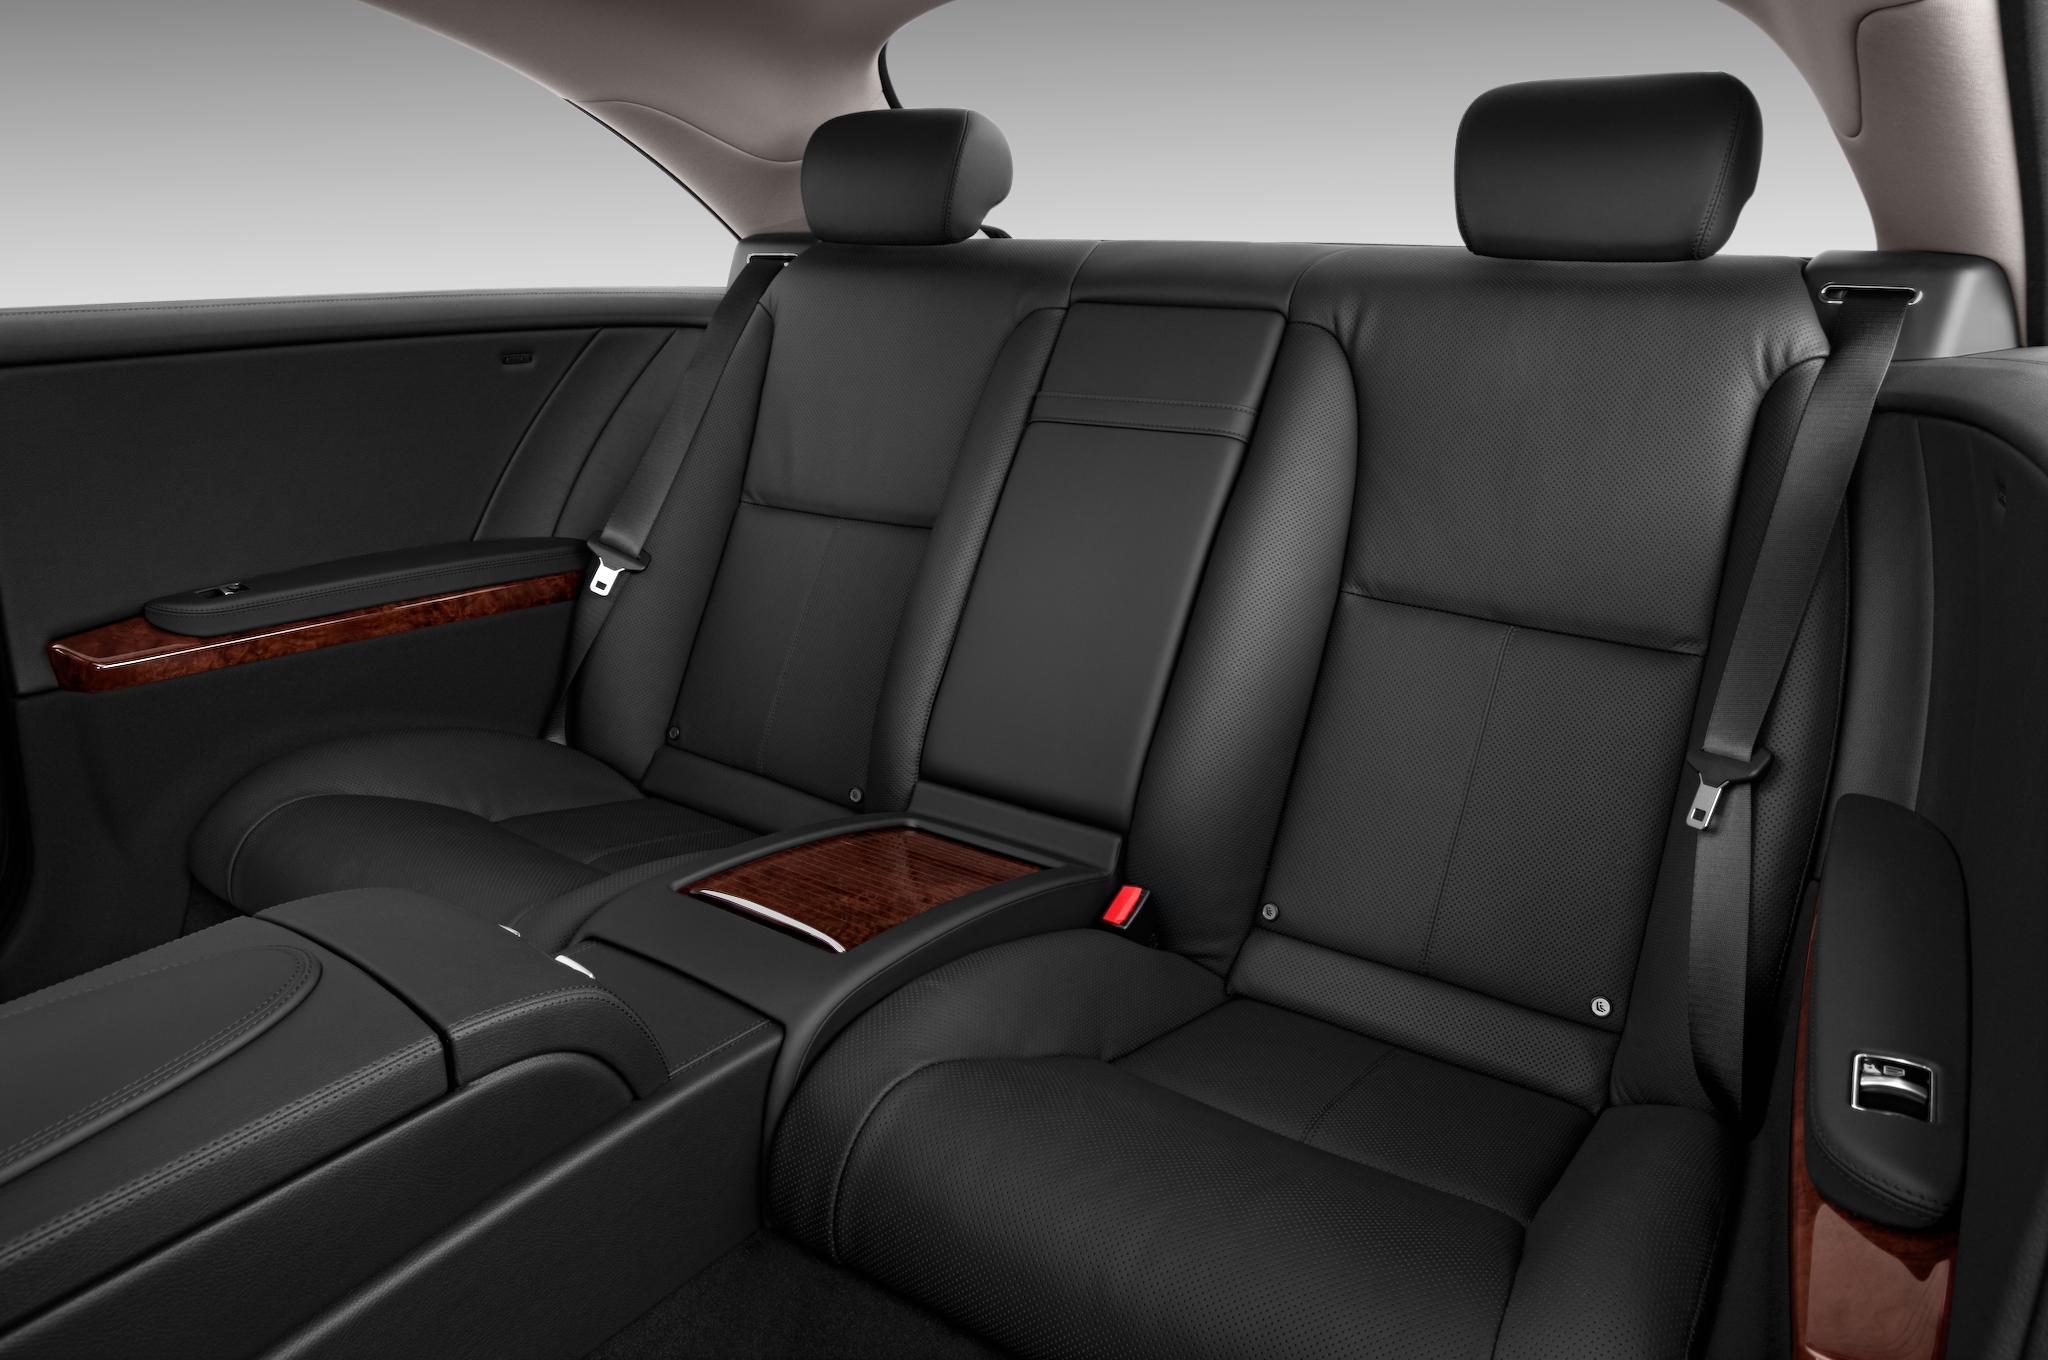 brabus builds 800 hp mercedes benz cl coupe. Black Bedroom Furniture Sets. Home Design Ideas